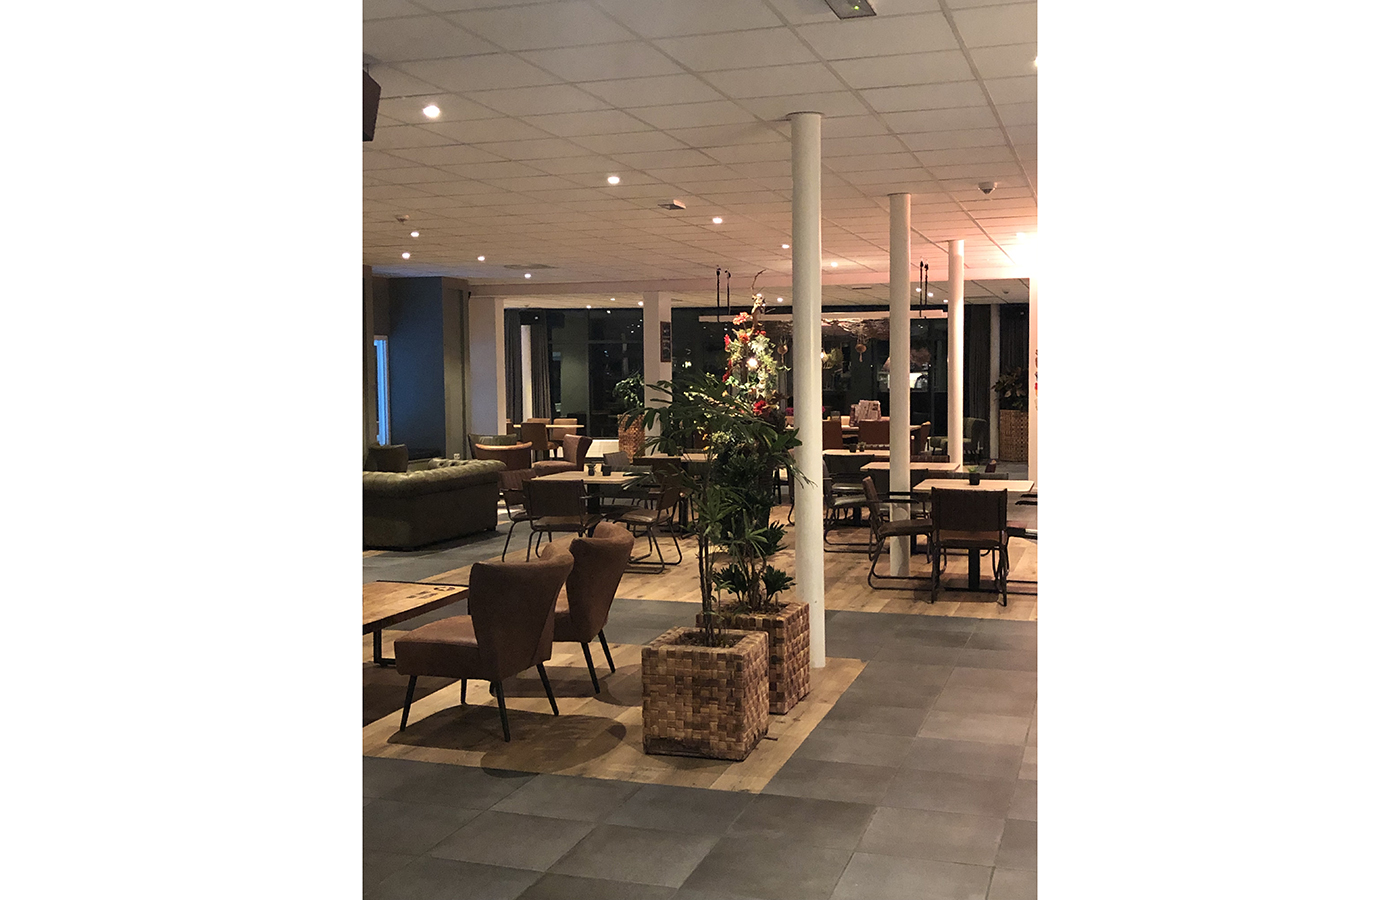 LEDSign project: Amstelhof